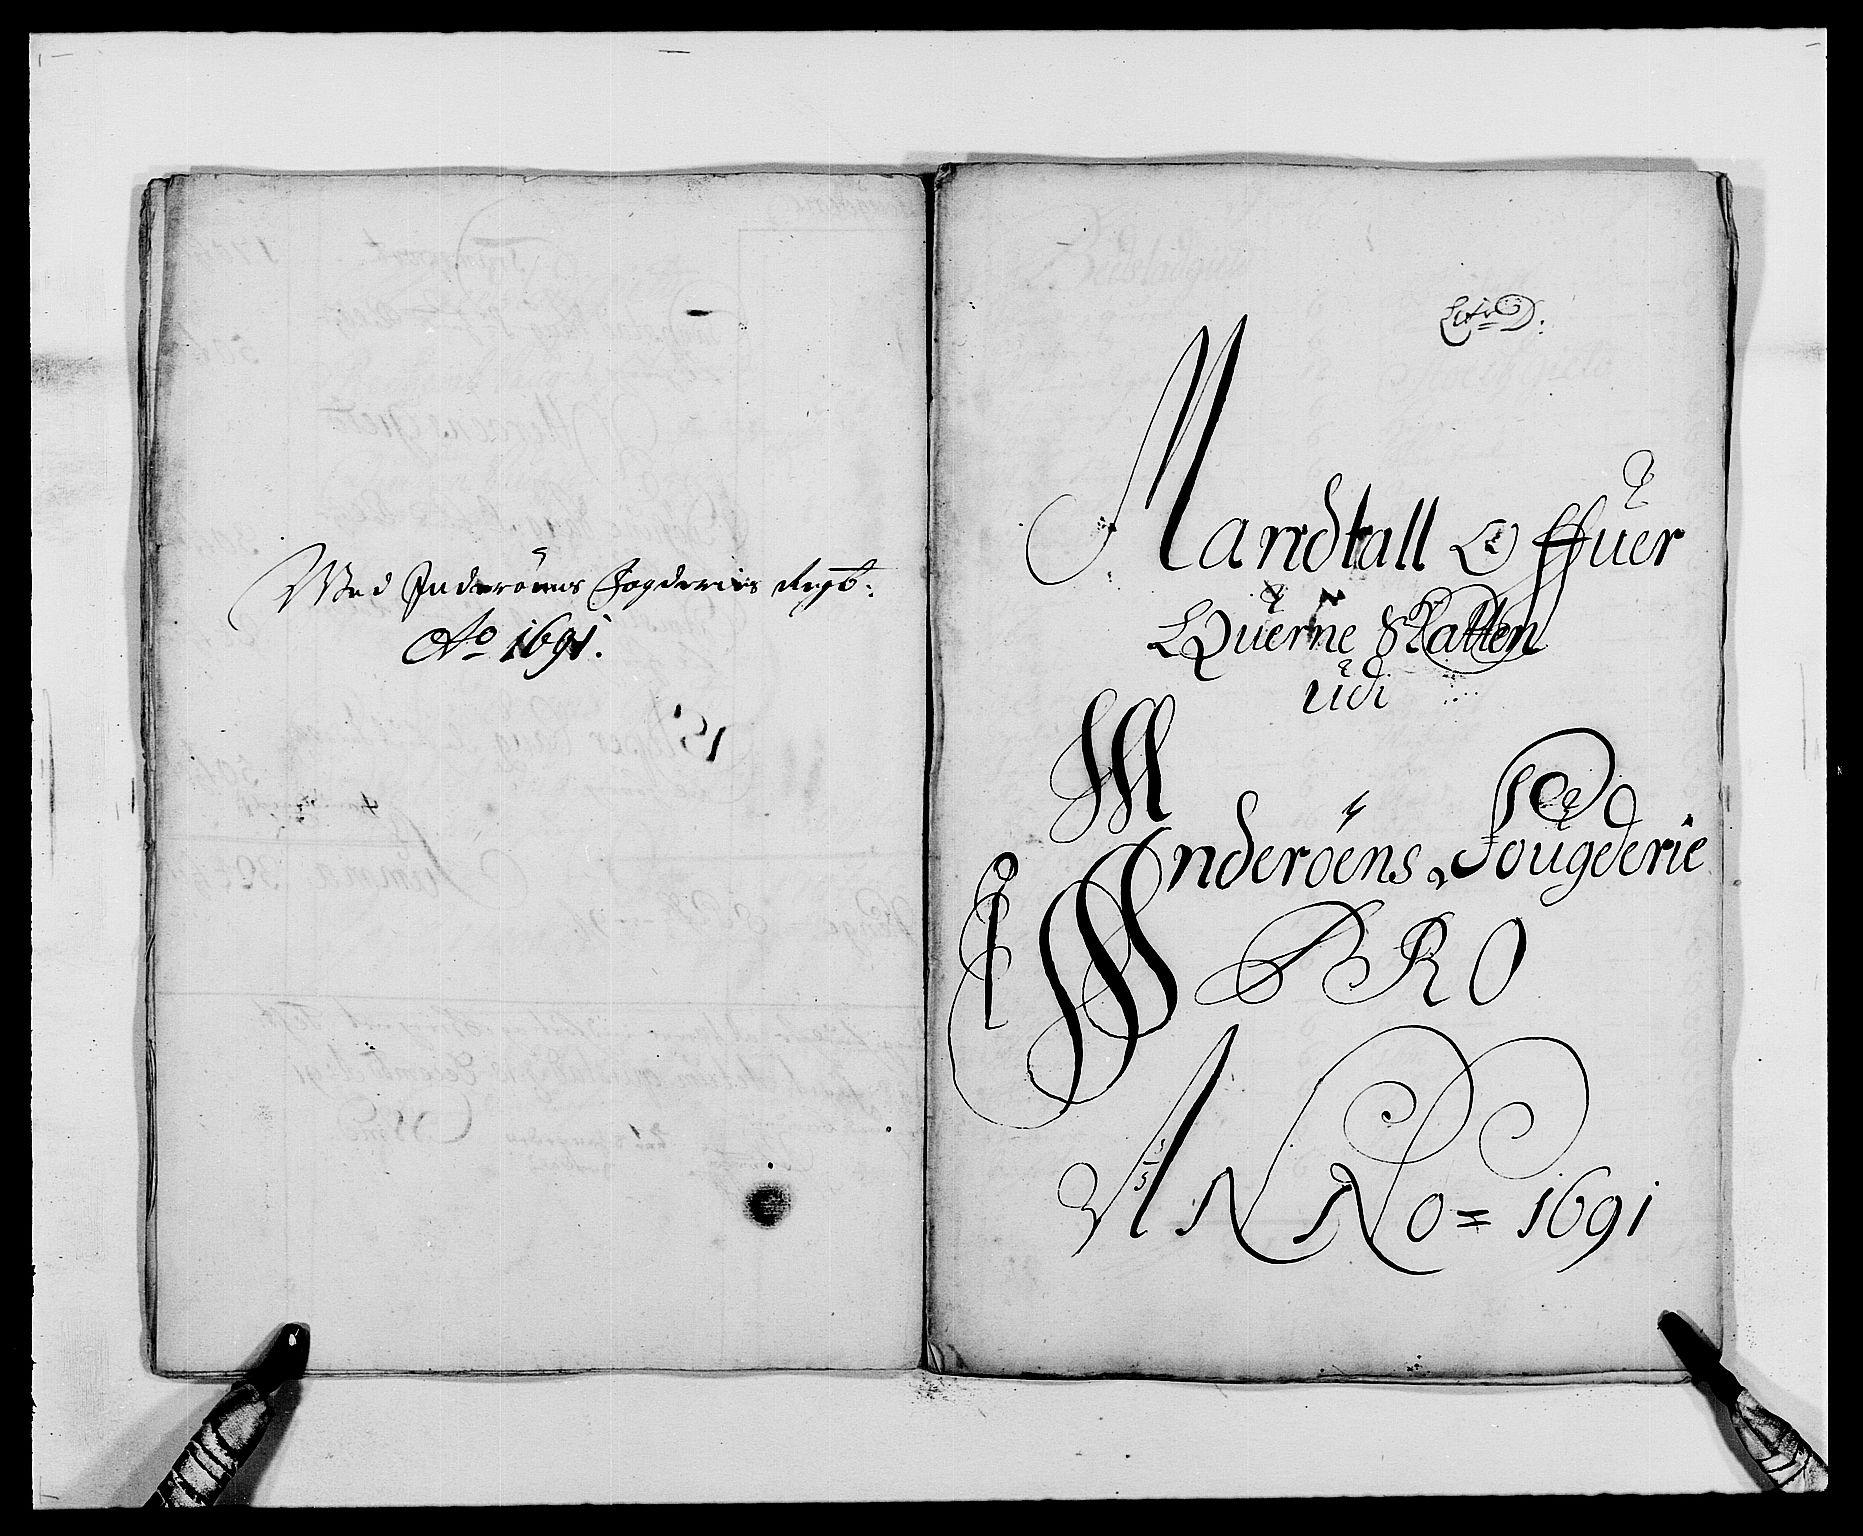 RA, Rentekammeret inntil 1814, Reviderte regnskaper, Fogderegnskap, R63/L4307: Fogderegnskap Inderøy, 1690-1691, s. 298